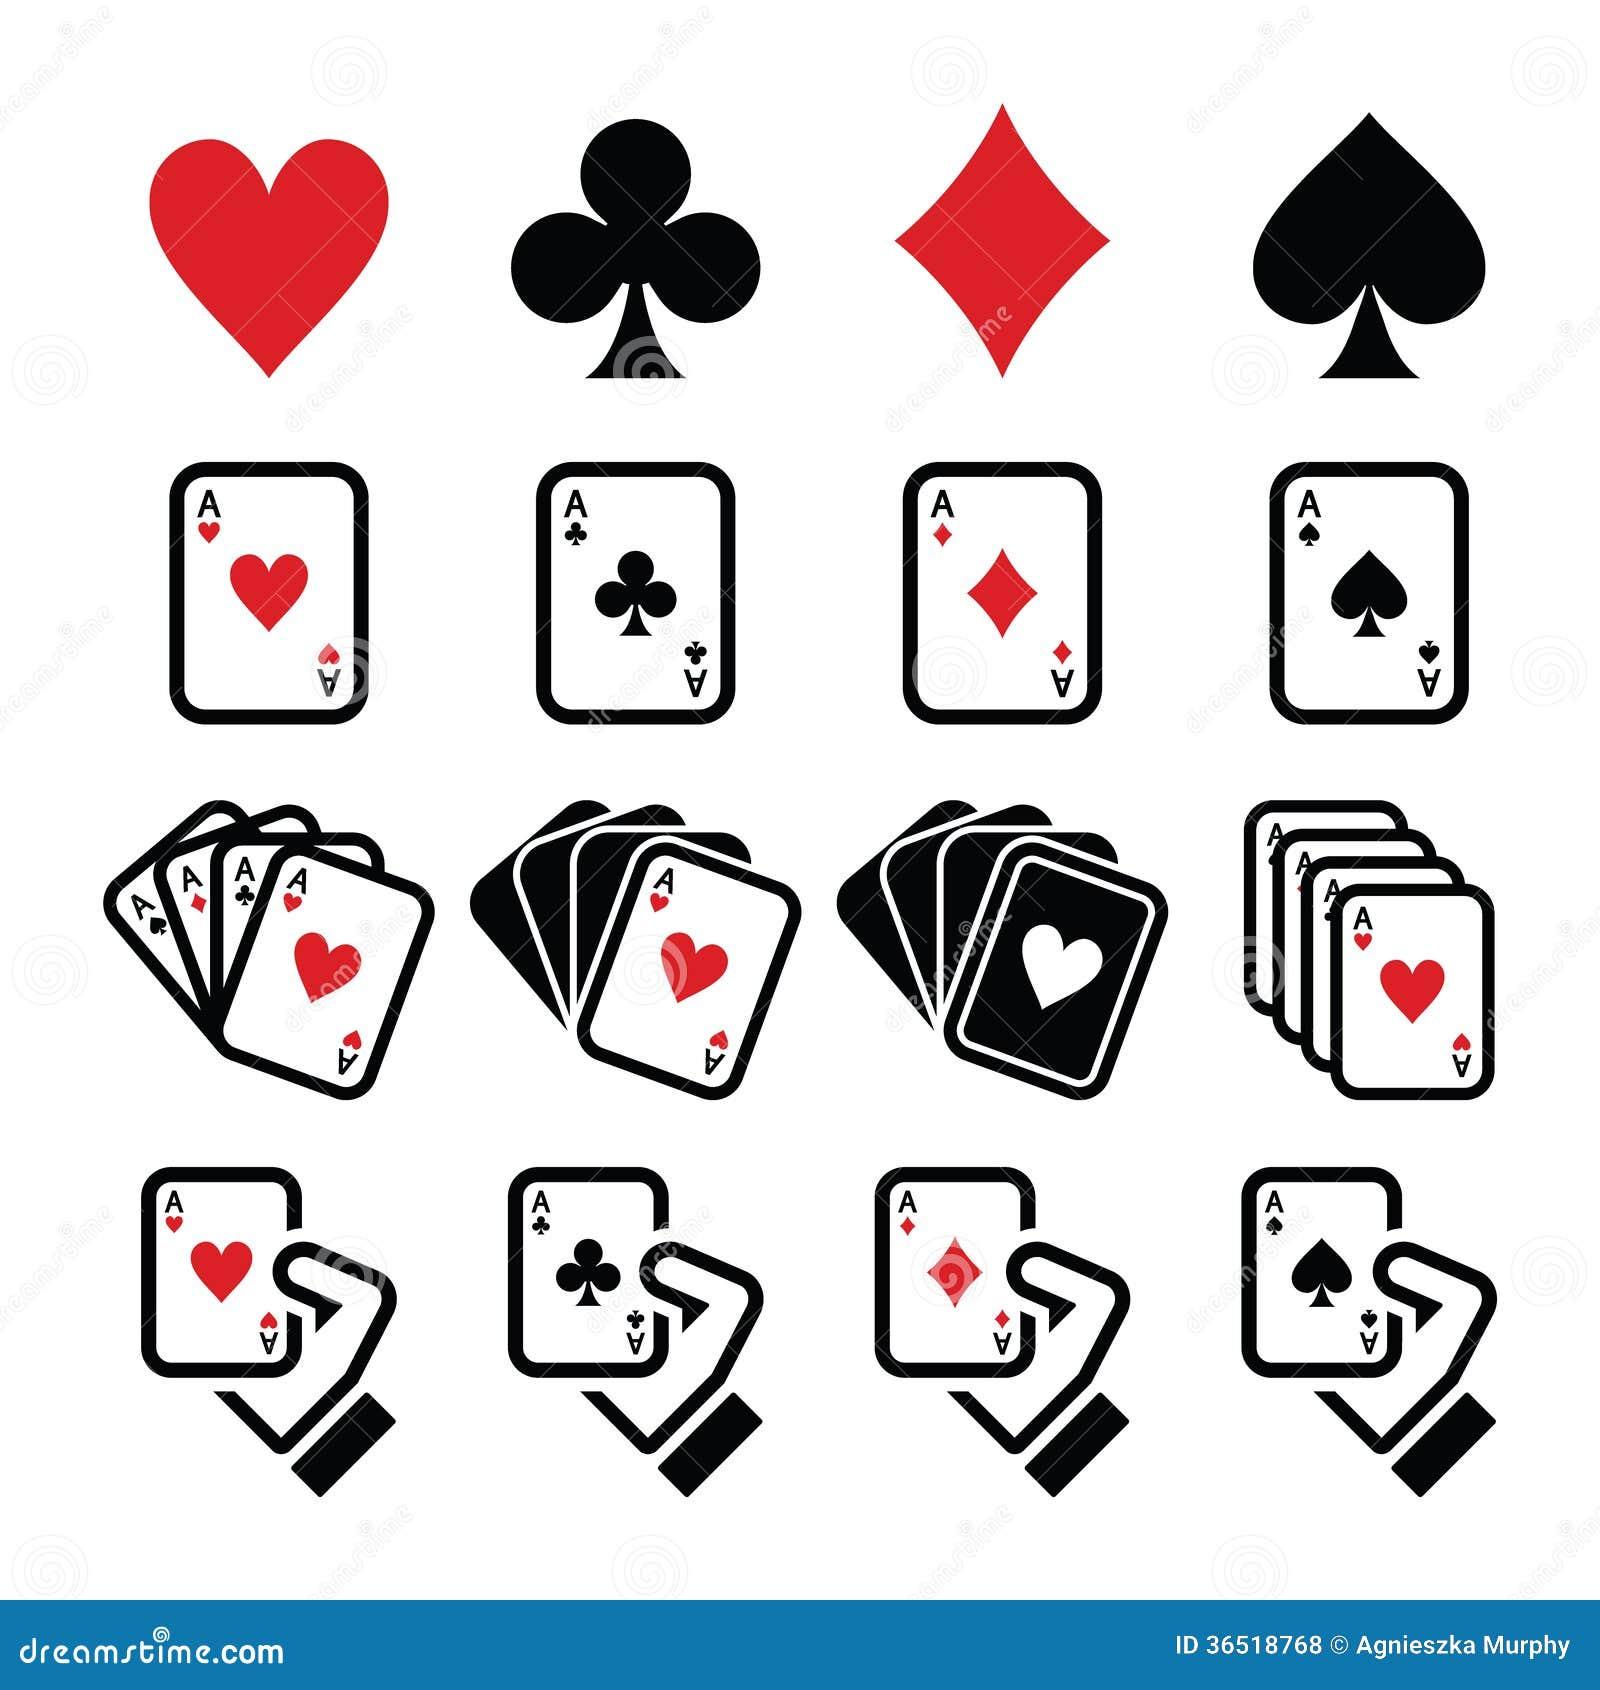 Descargar poker timer gratis